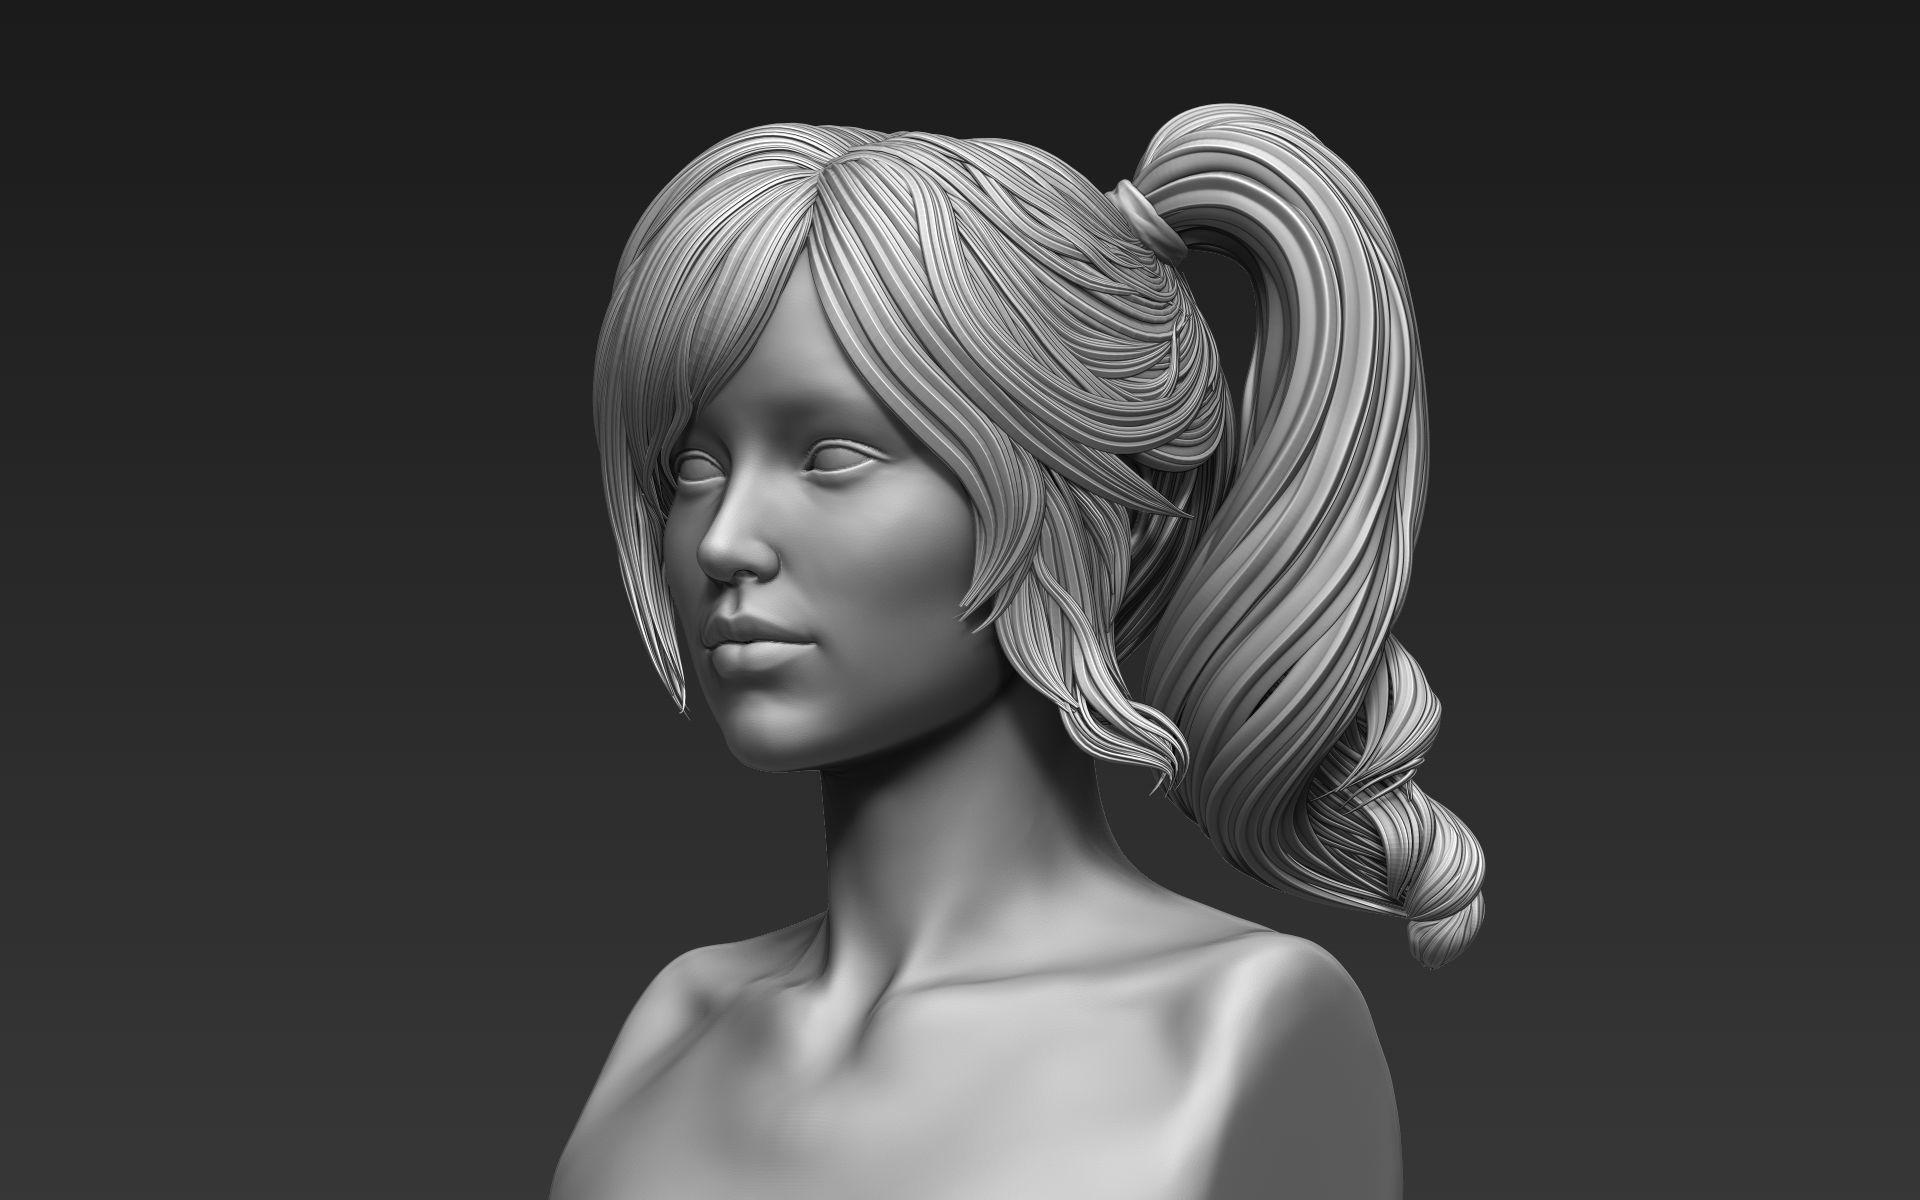 Zbrush Hair Sculpt 03 3d Model Cgtrader